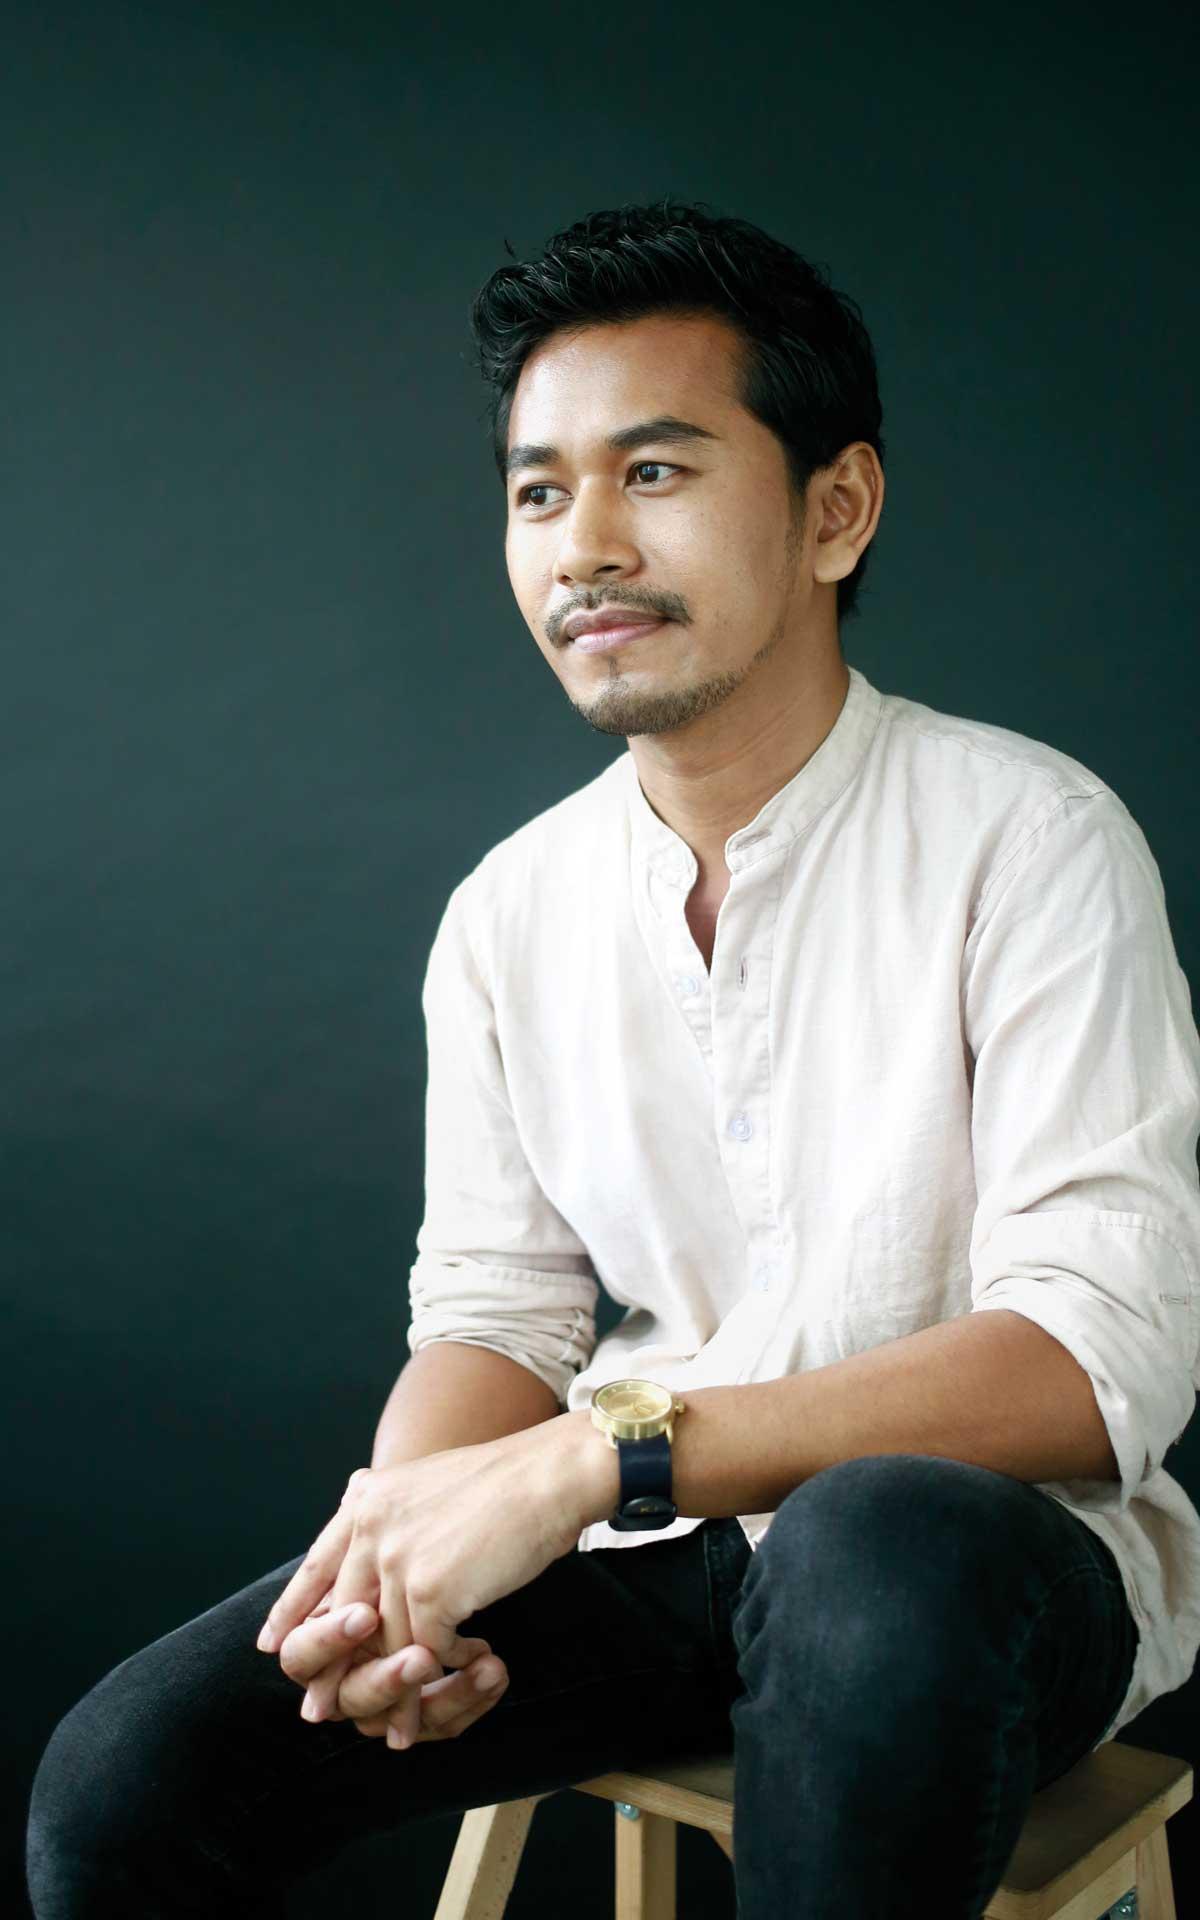 Kerol Izwan, Editorin Chief at Musotrees Magazine